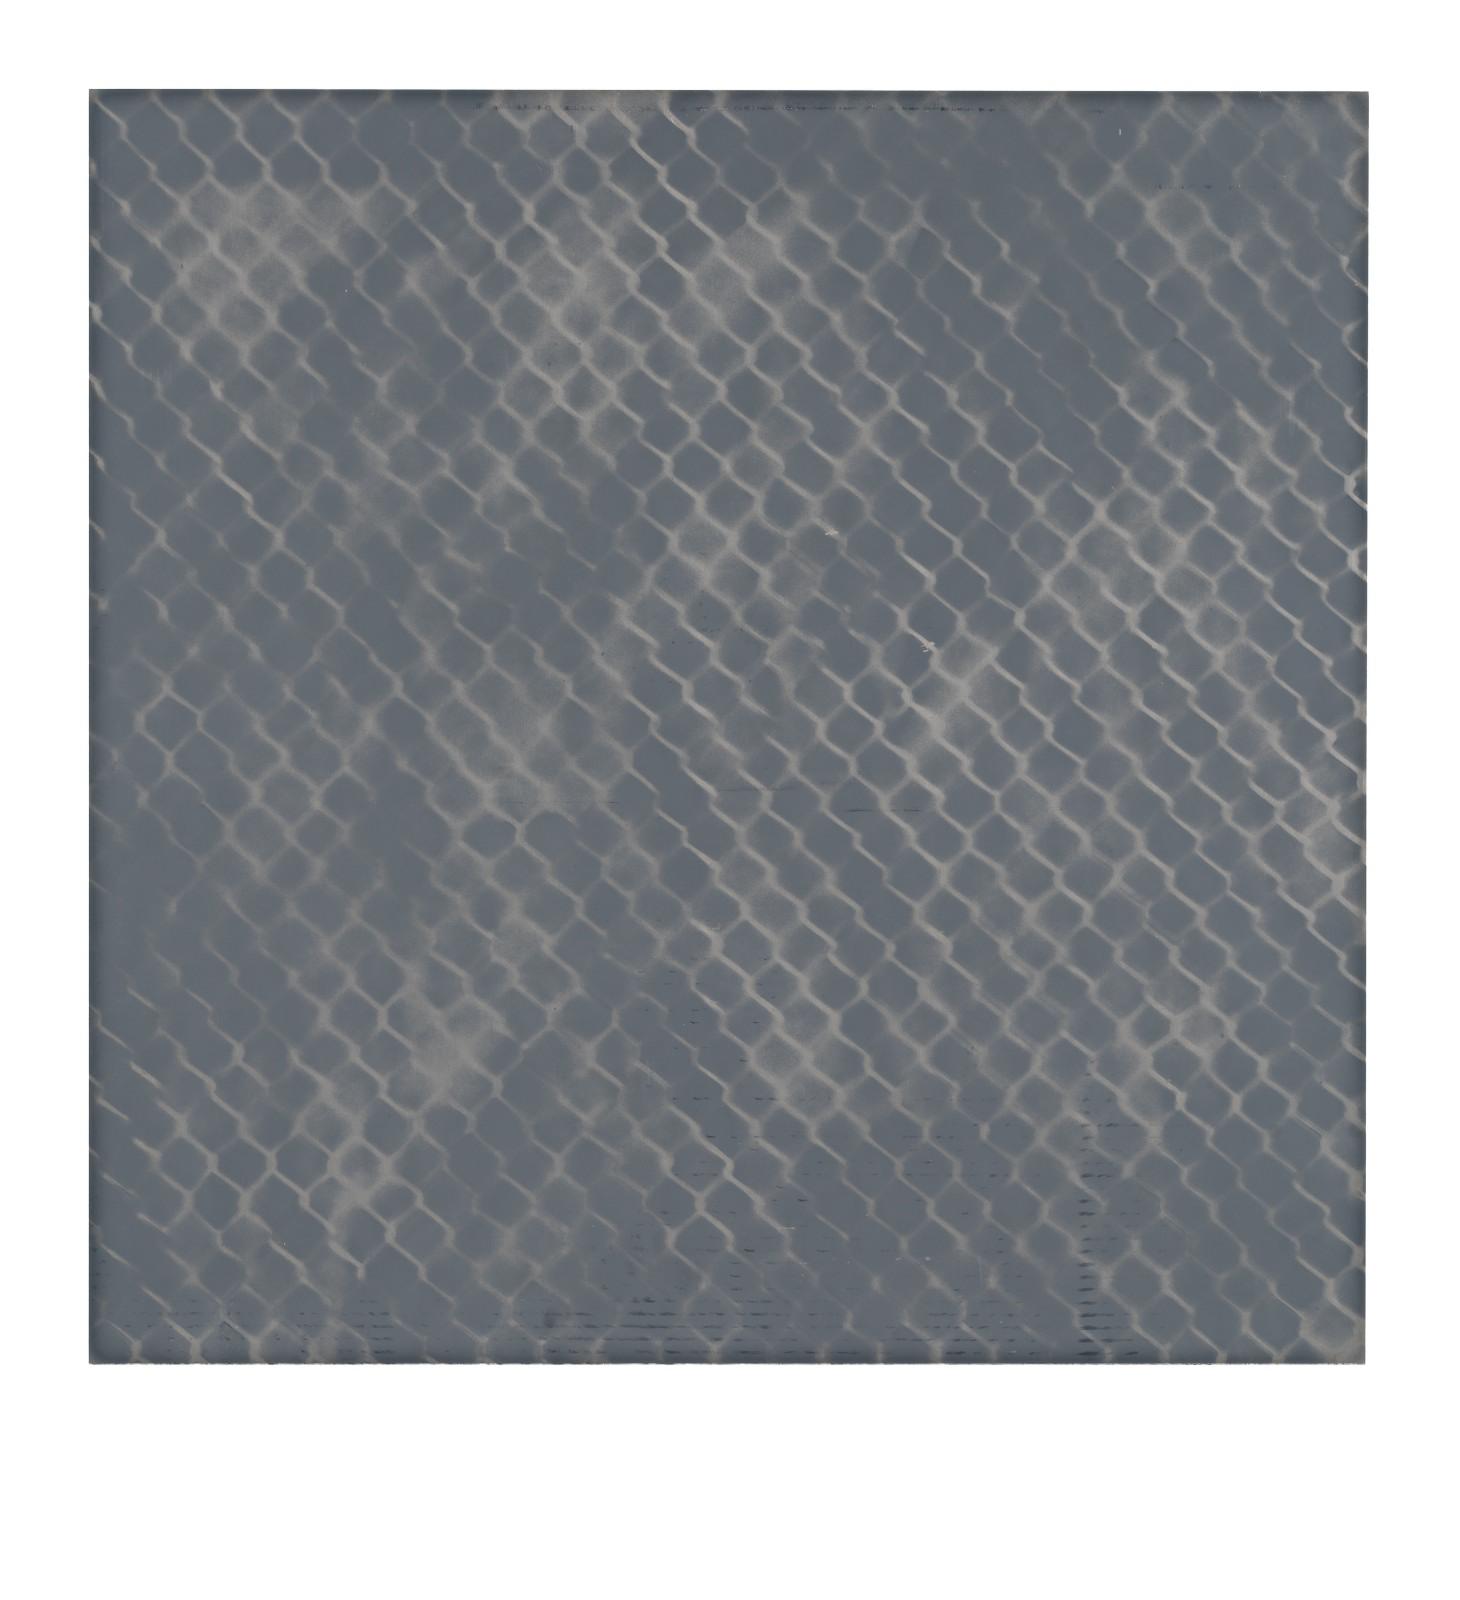 "STAIN : 40°42'43.6""N 73°56'03.7""W, 2015, spraypaint on aluminium, 81,3 x 81,3 cm"